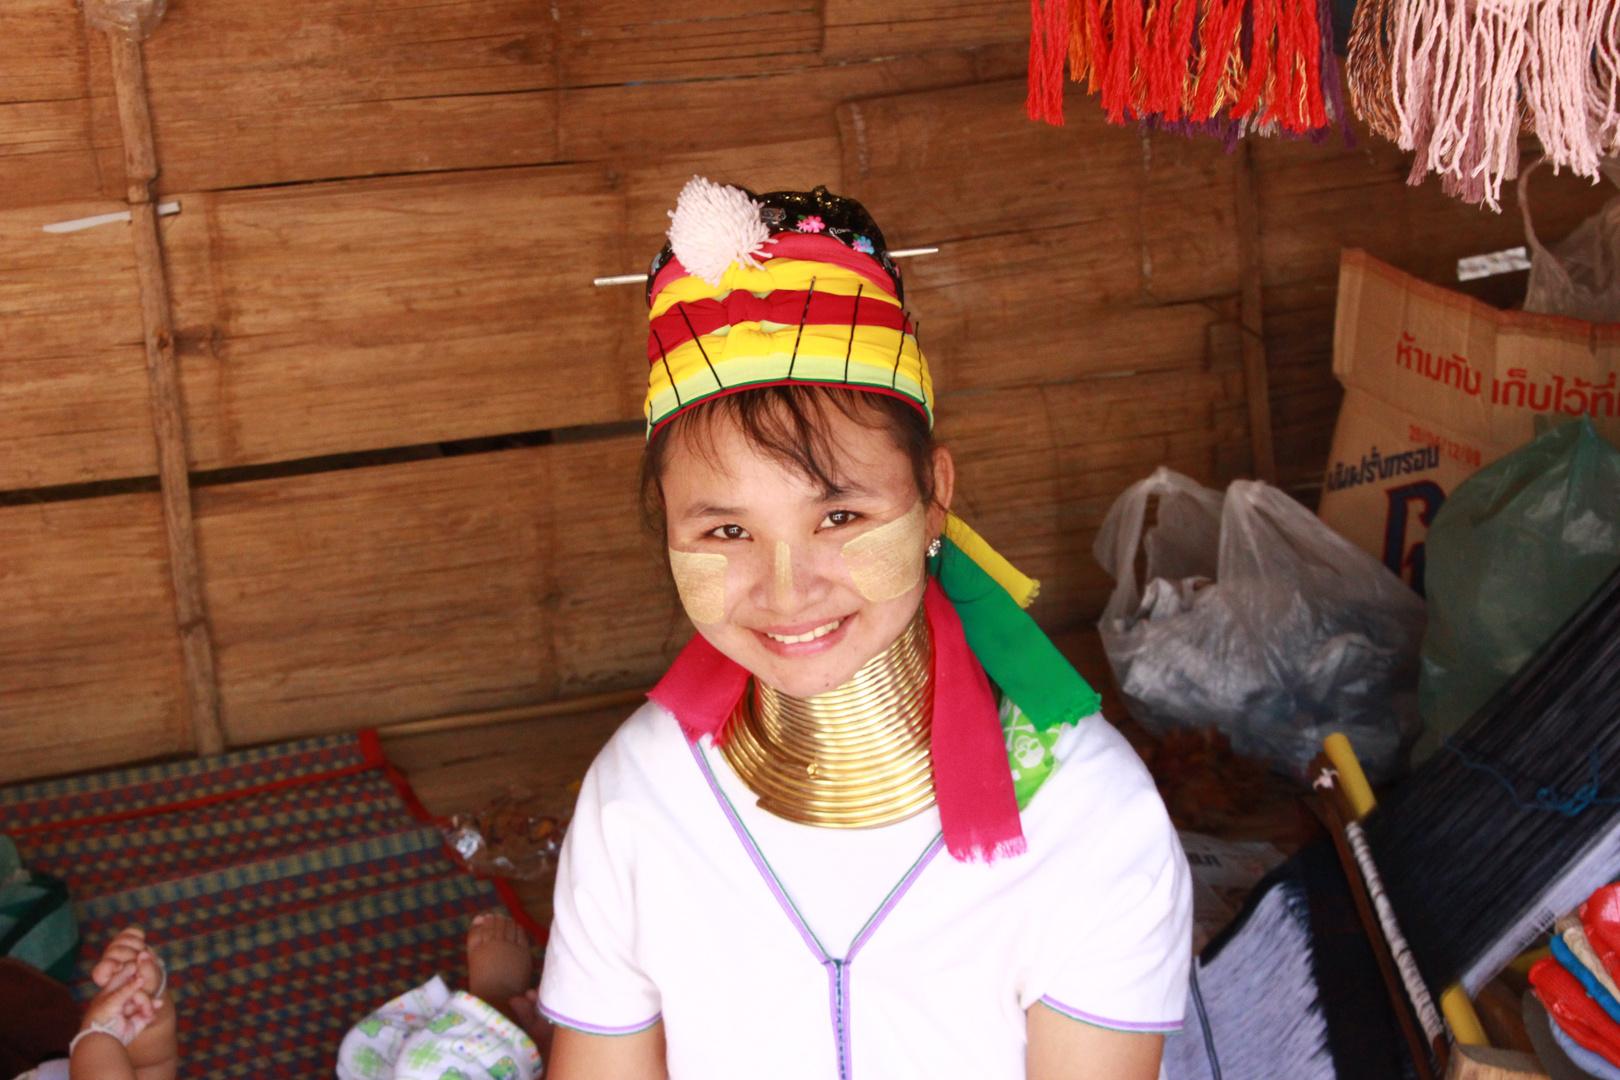 Langhalsfrau Thailand